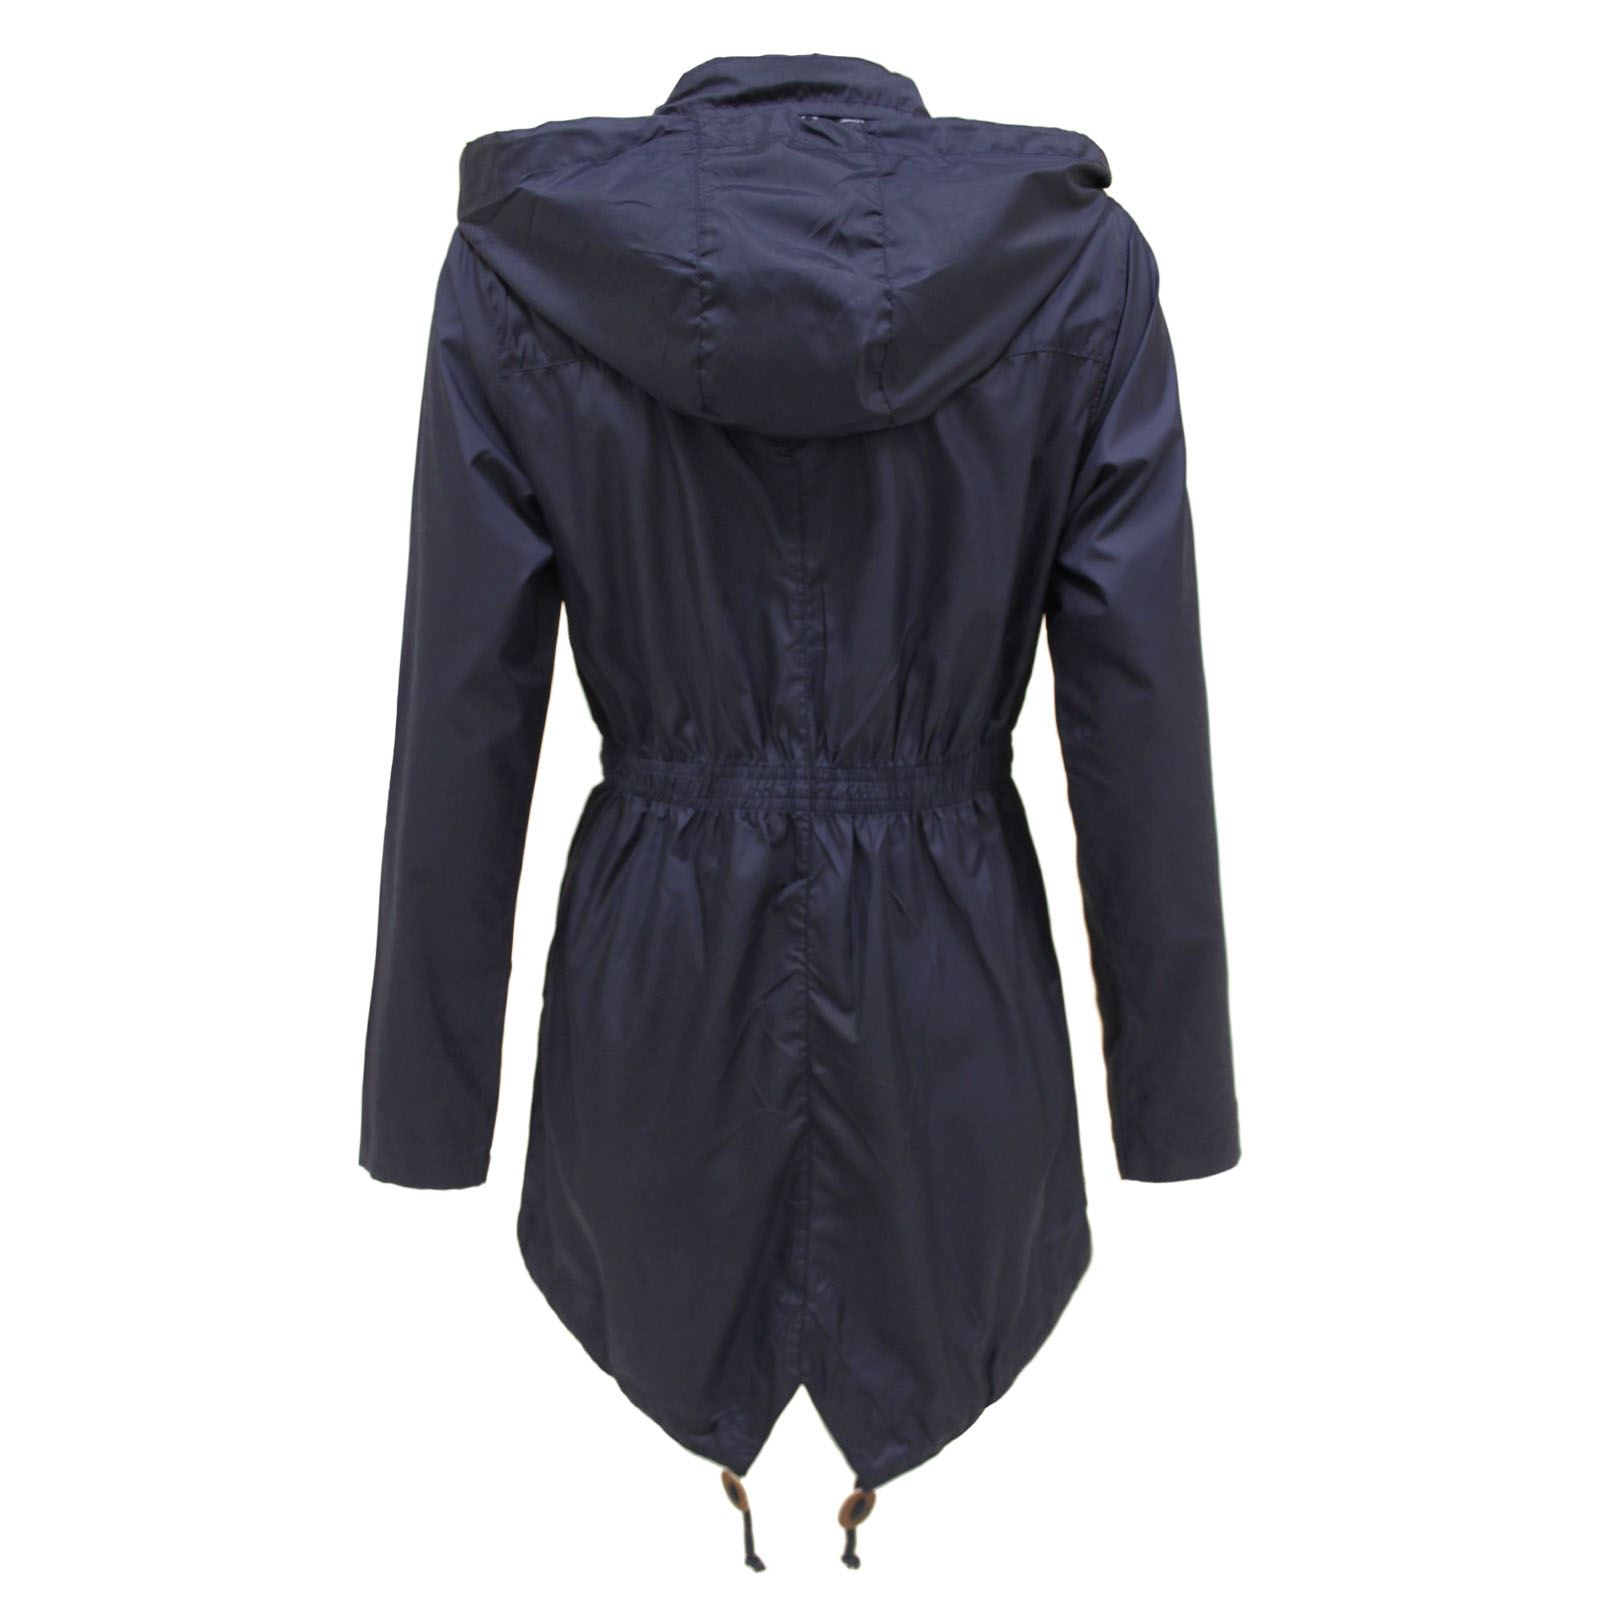 hooded raincoats for women - photo #16